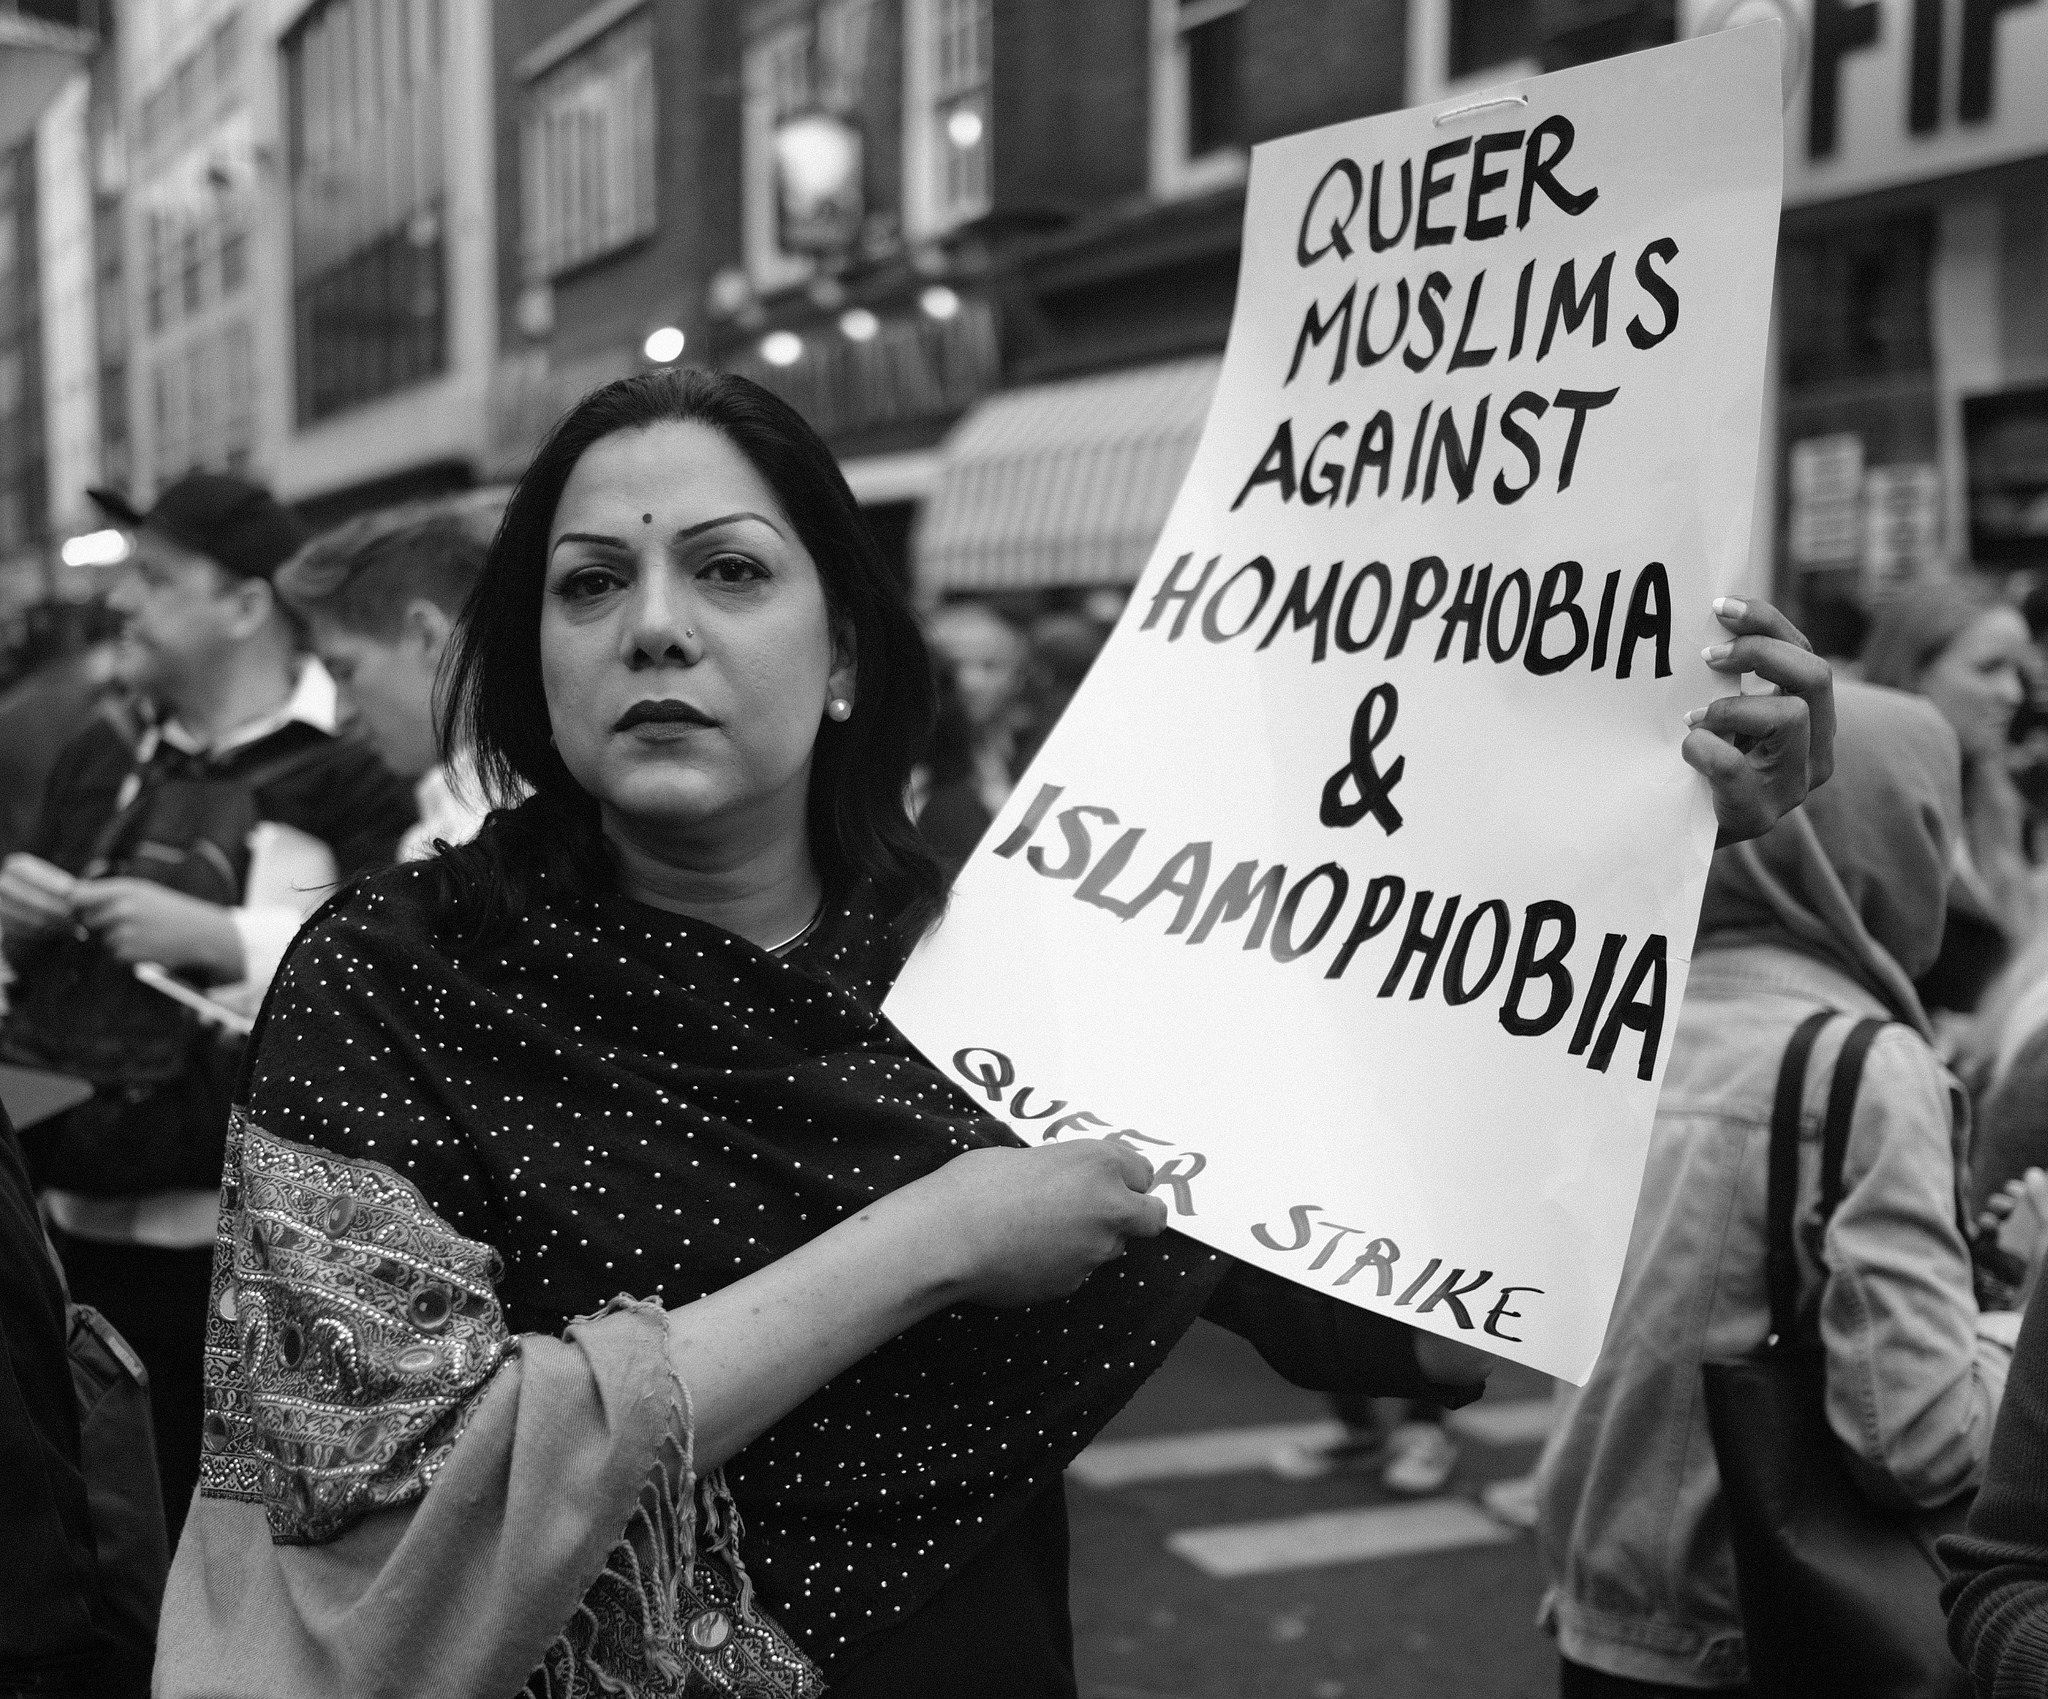 Alisdare Hickson, Queer Muslims Against Homophobia, London, Orlando Shooting, Vigil